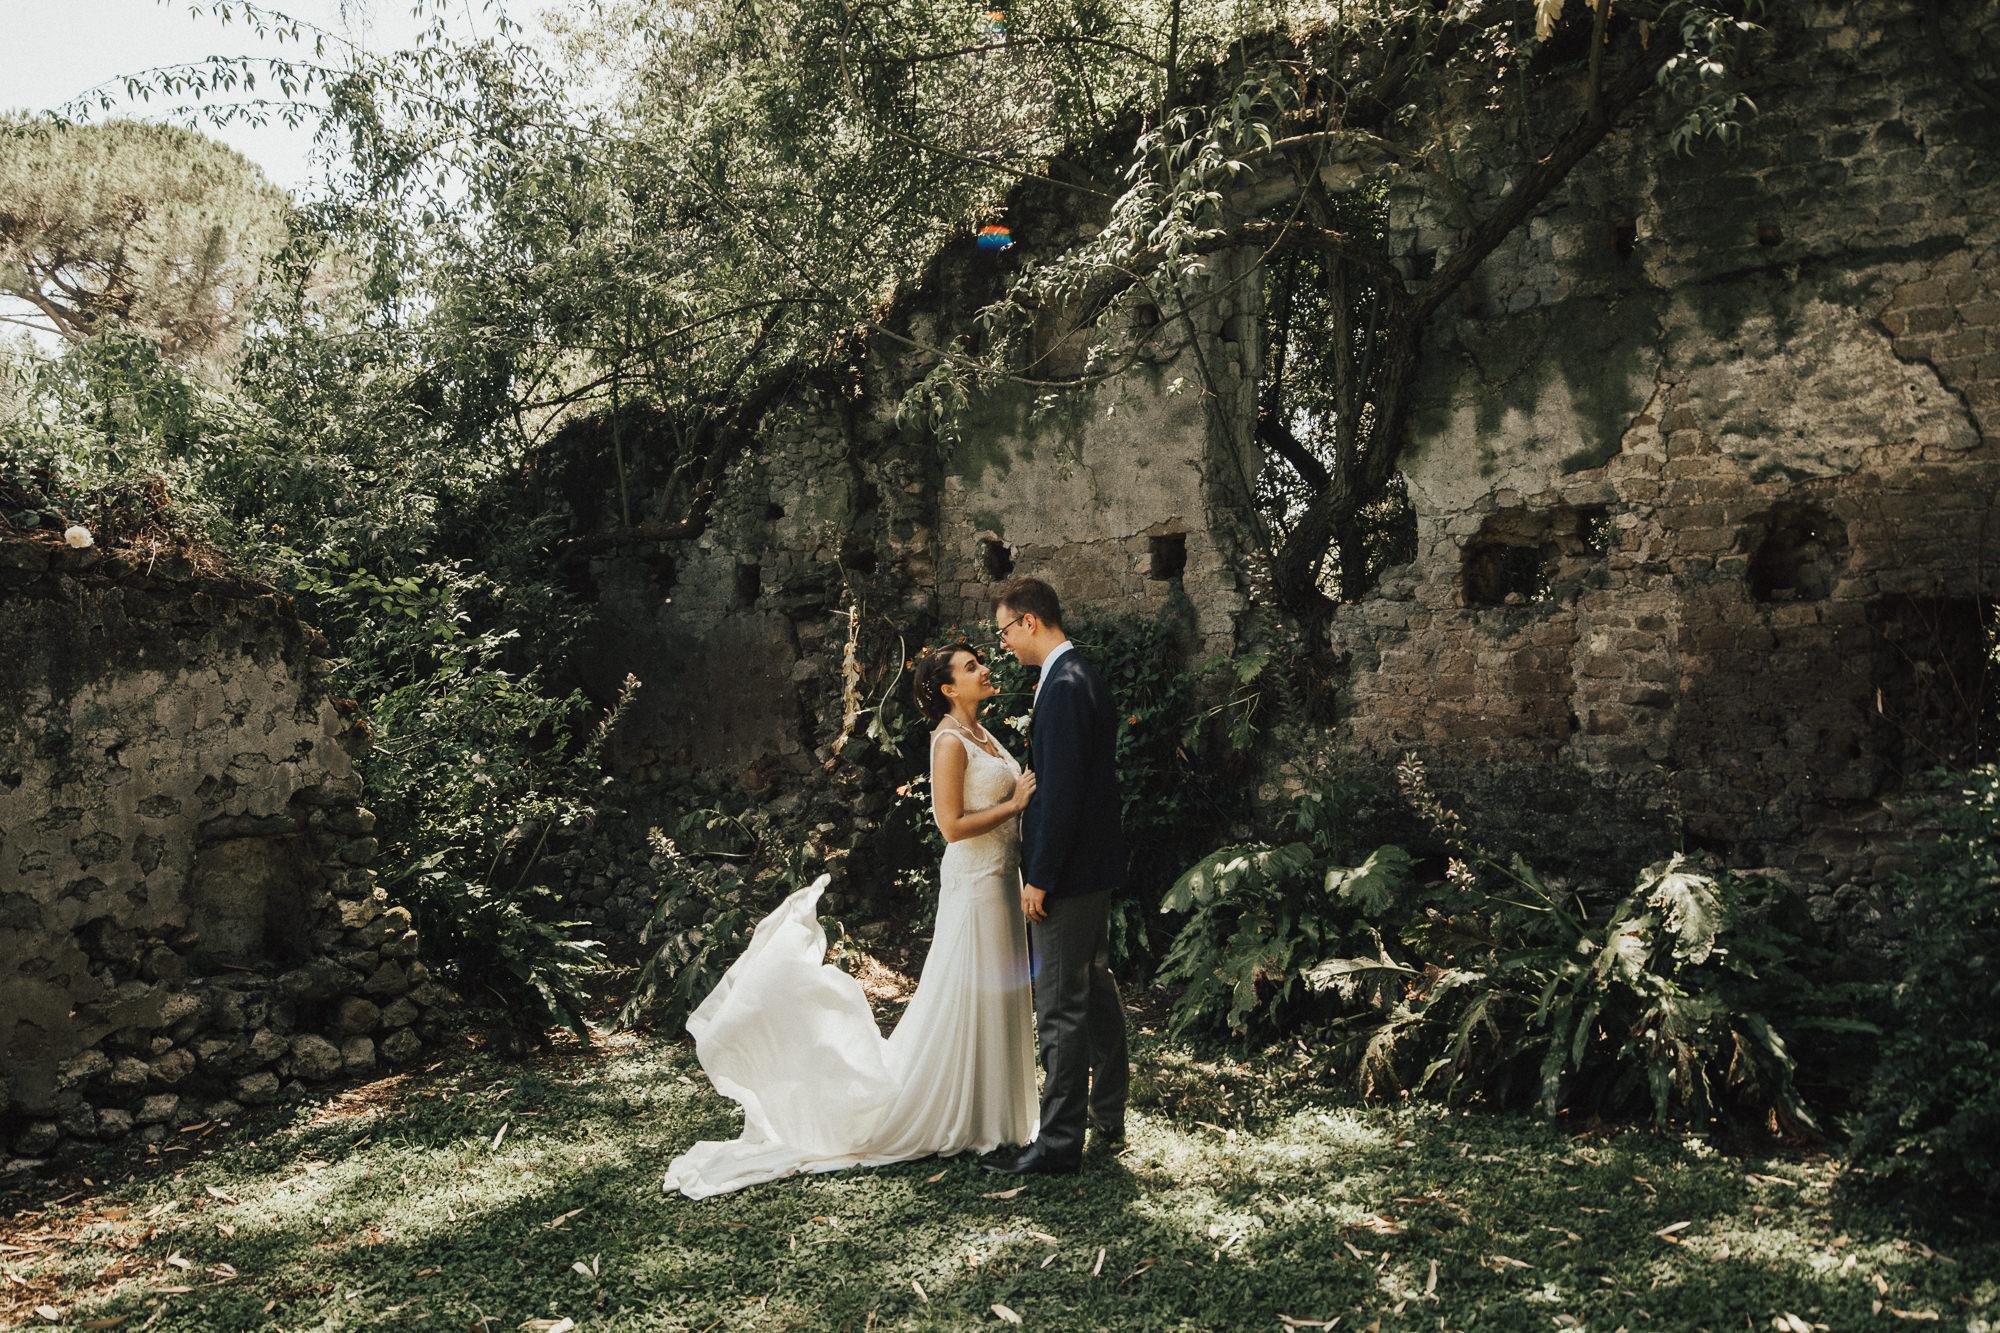 Lelia & Silvio I Wedding in Italy